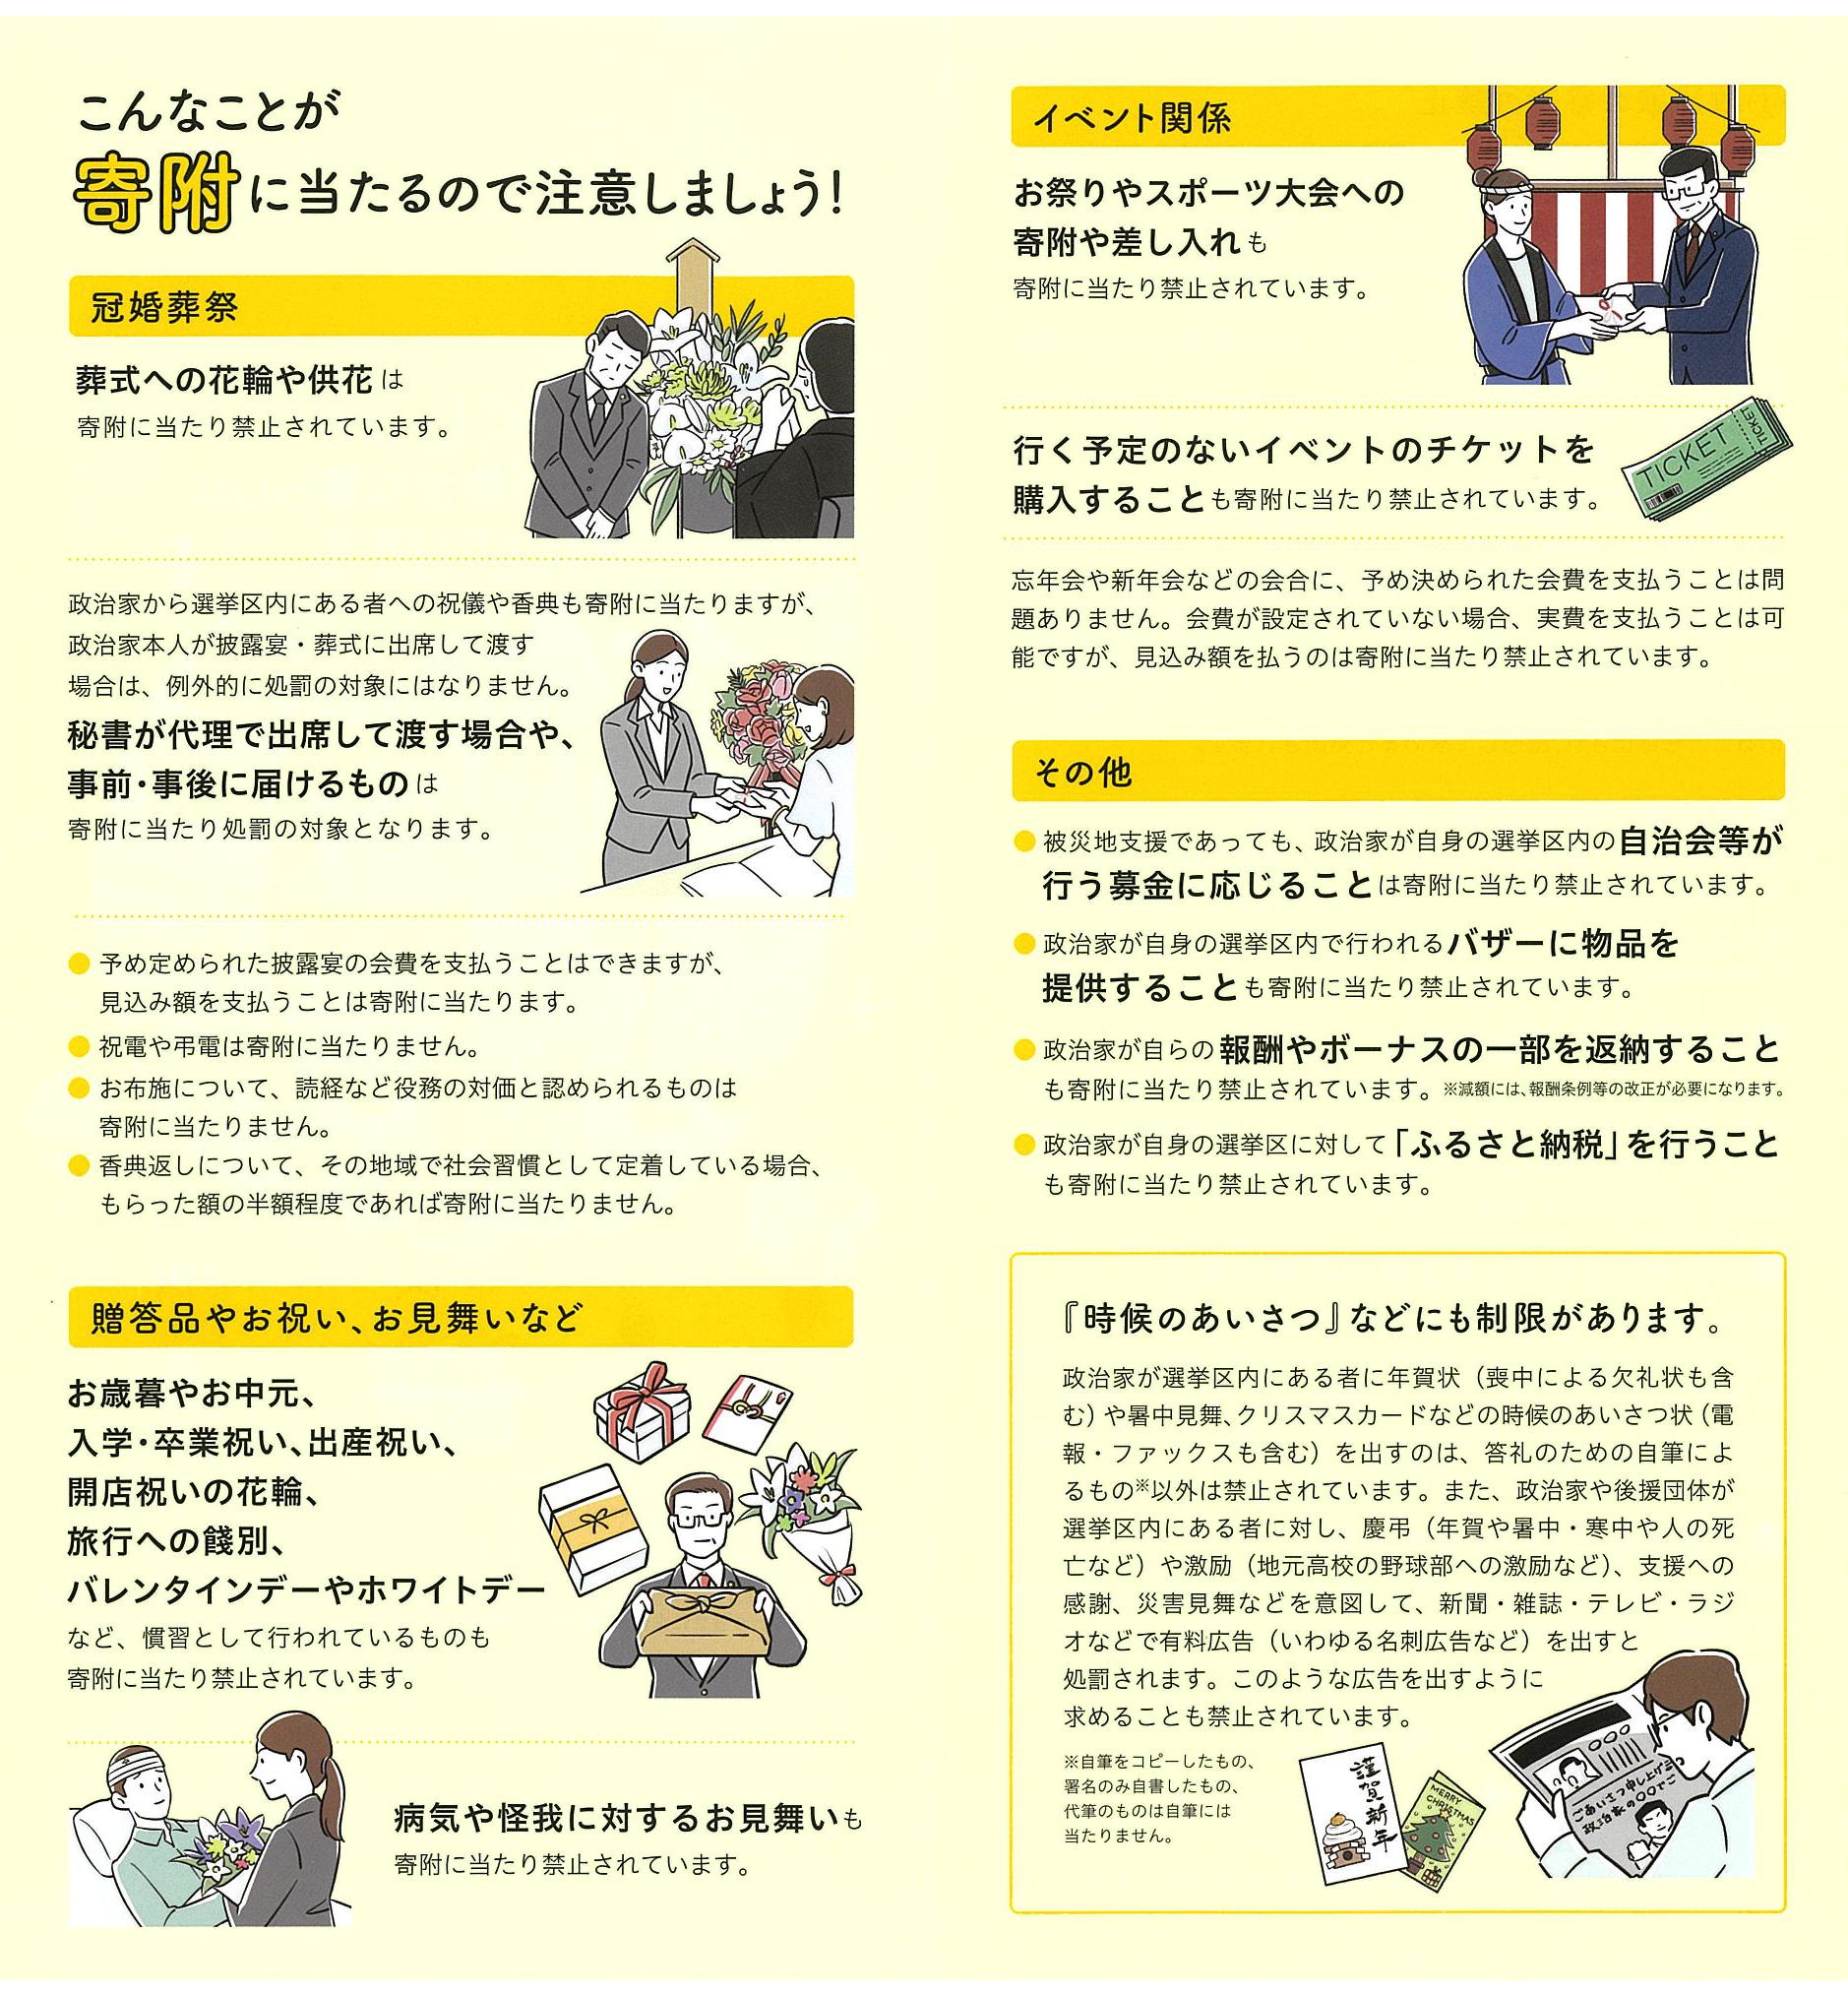 寄附禁止(3)